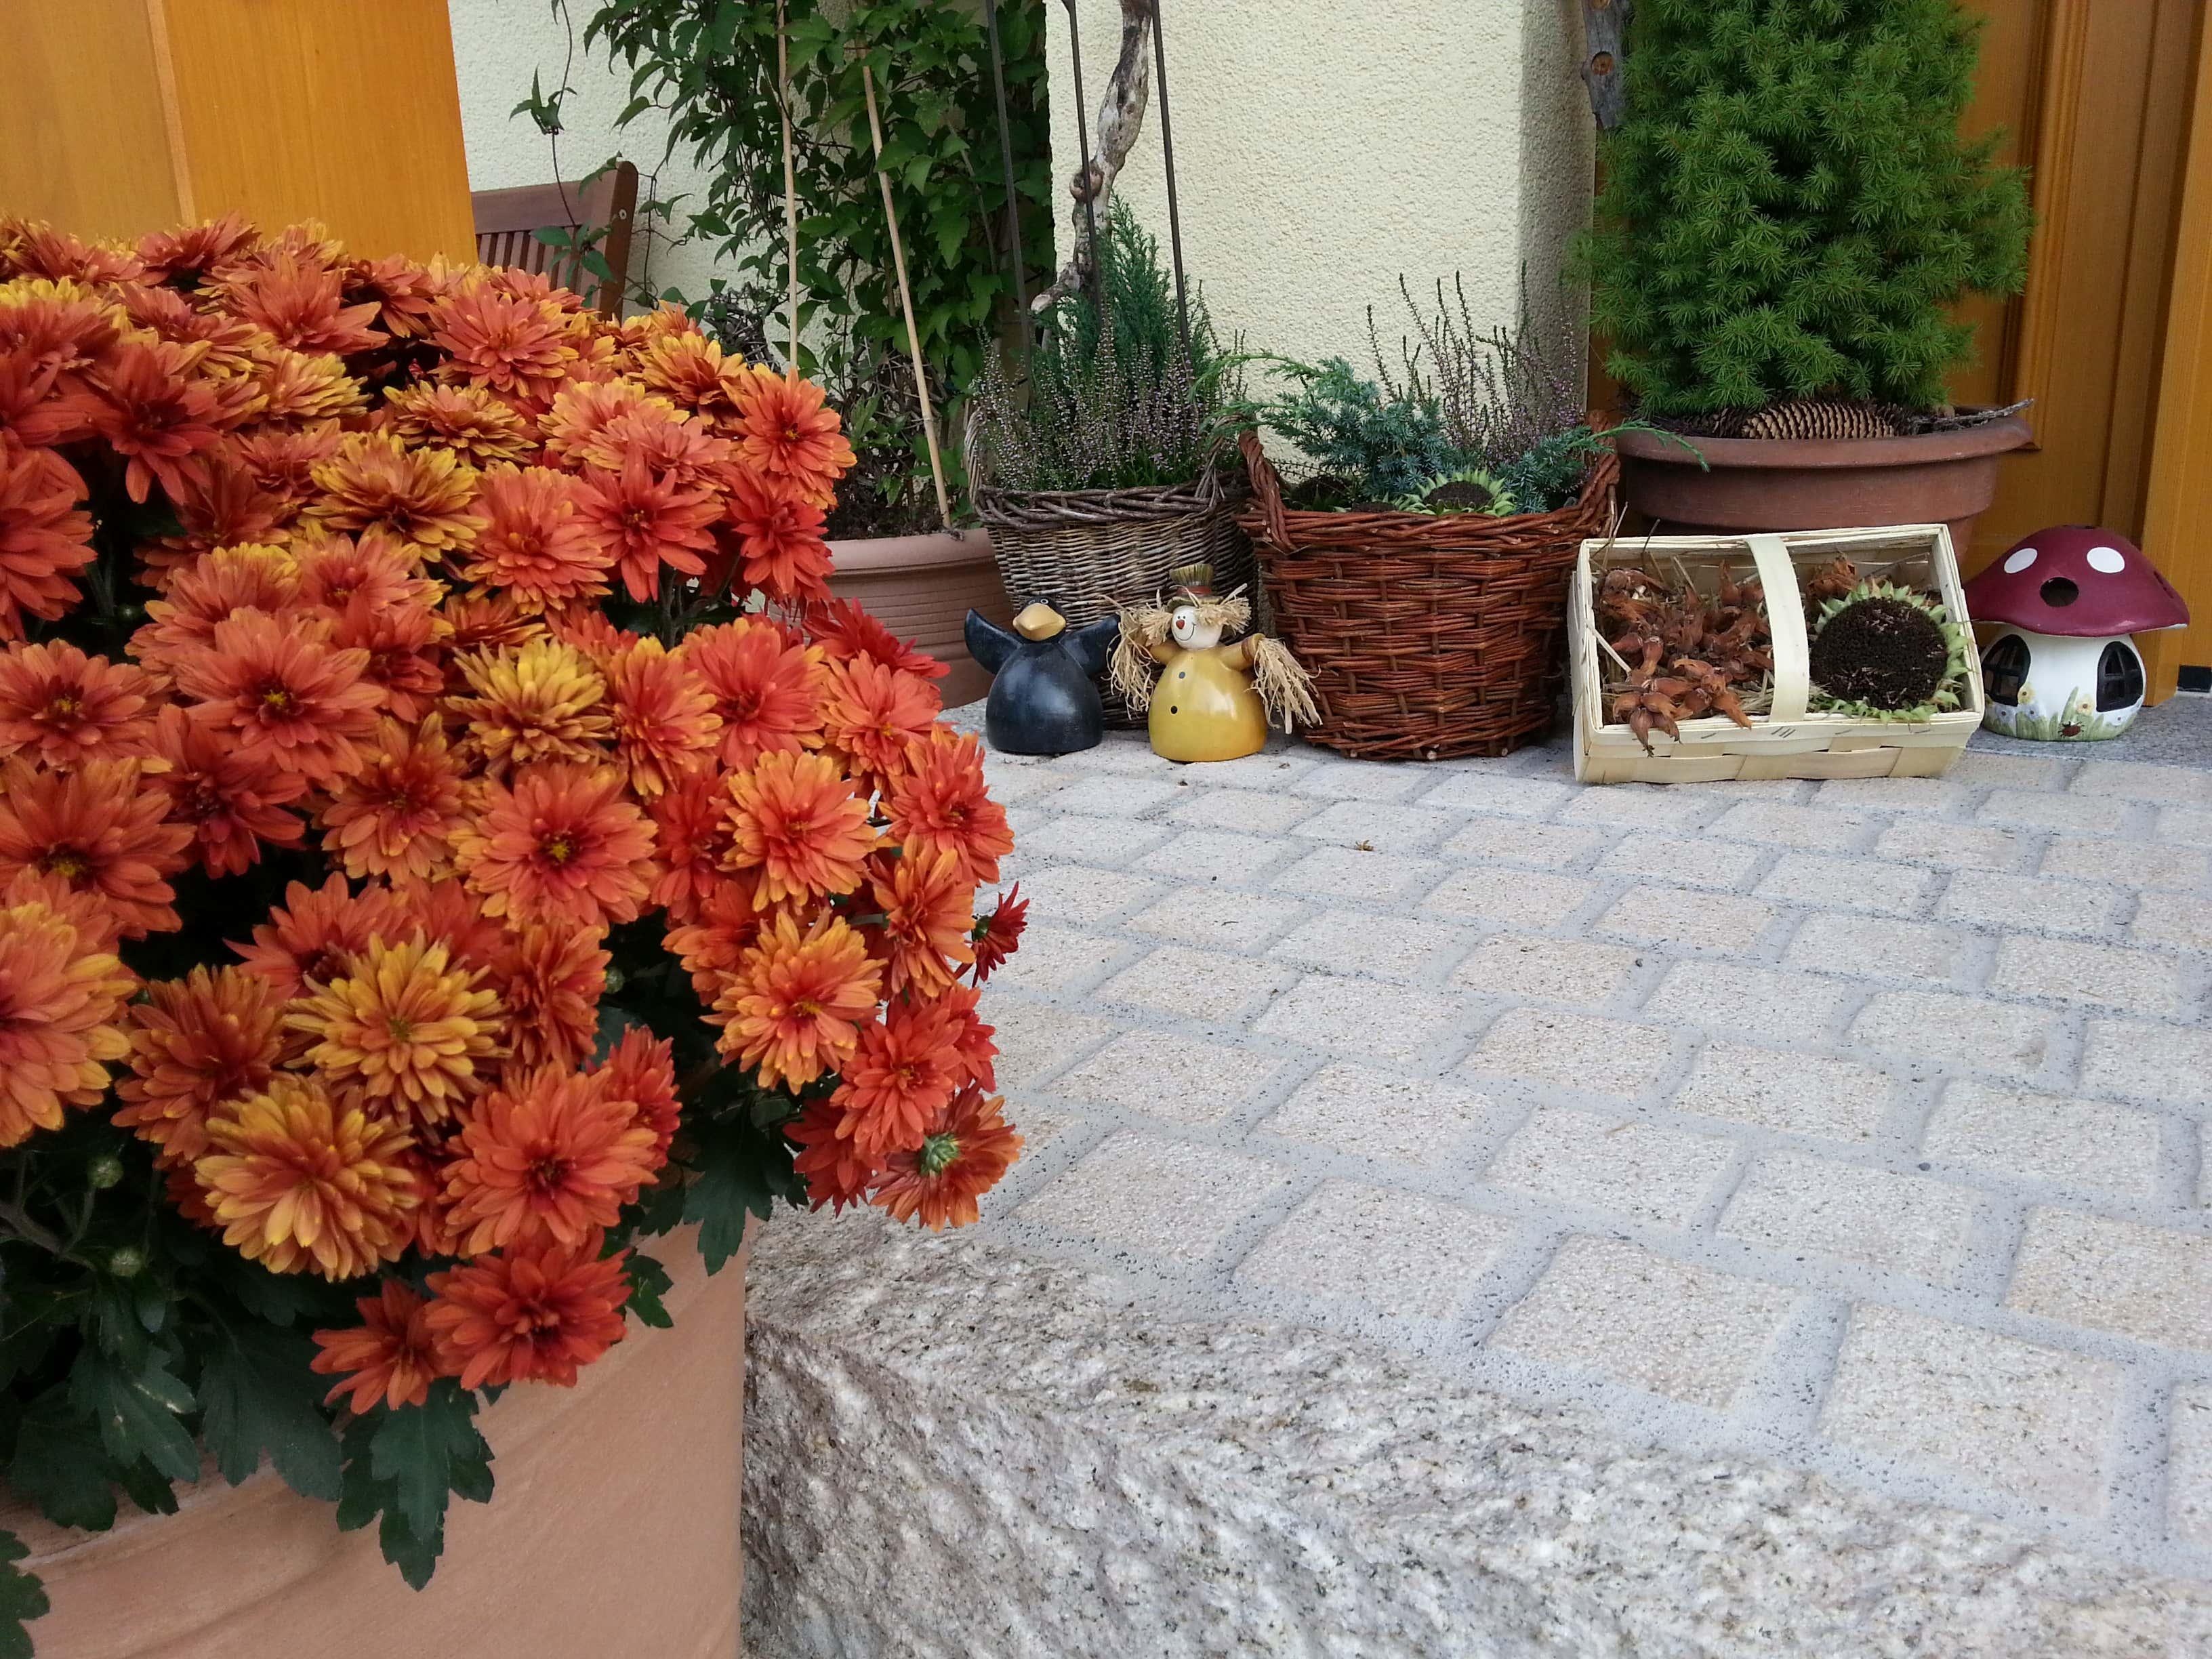 terrasse-herbst-deko-blumen-rot